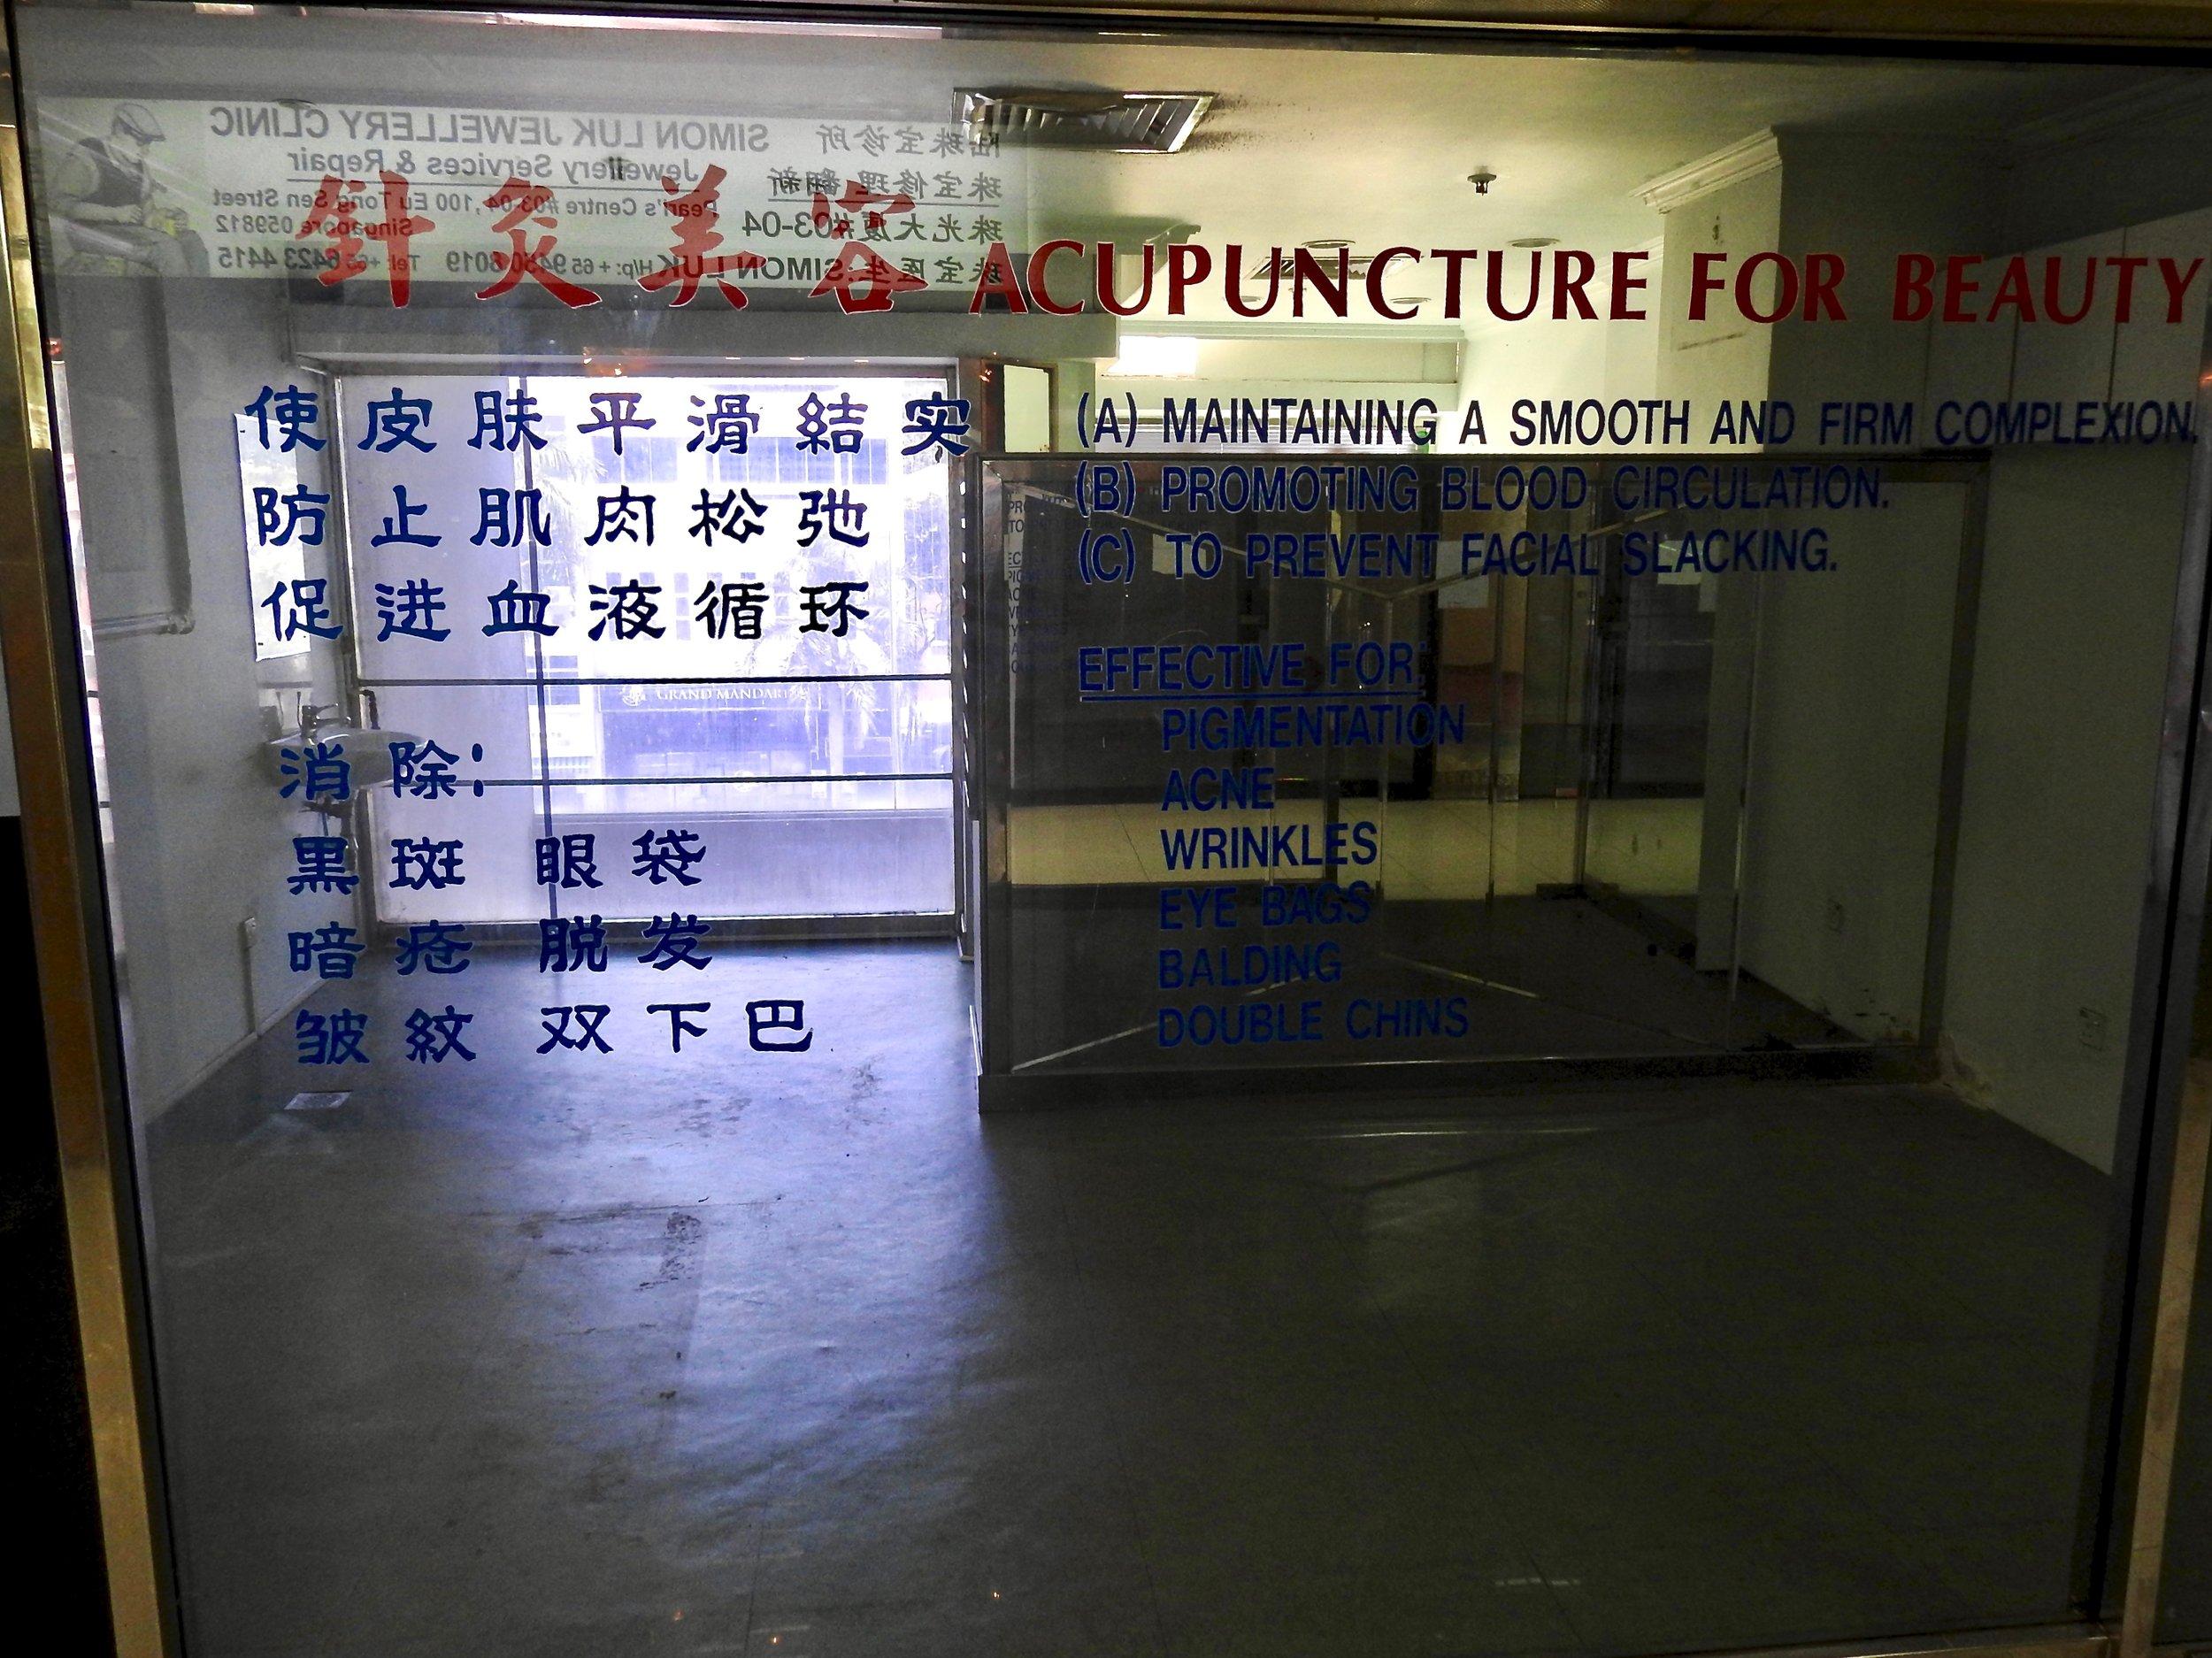 Closed acupuncture  shop in Pearls Centre, Singapore. Photo: (C) Remko Tanis